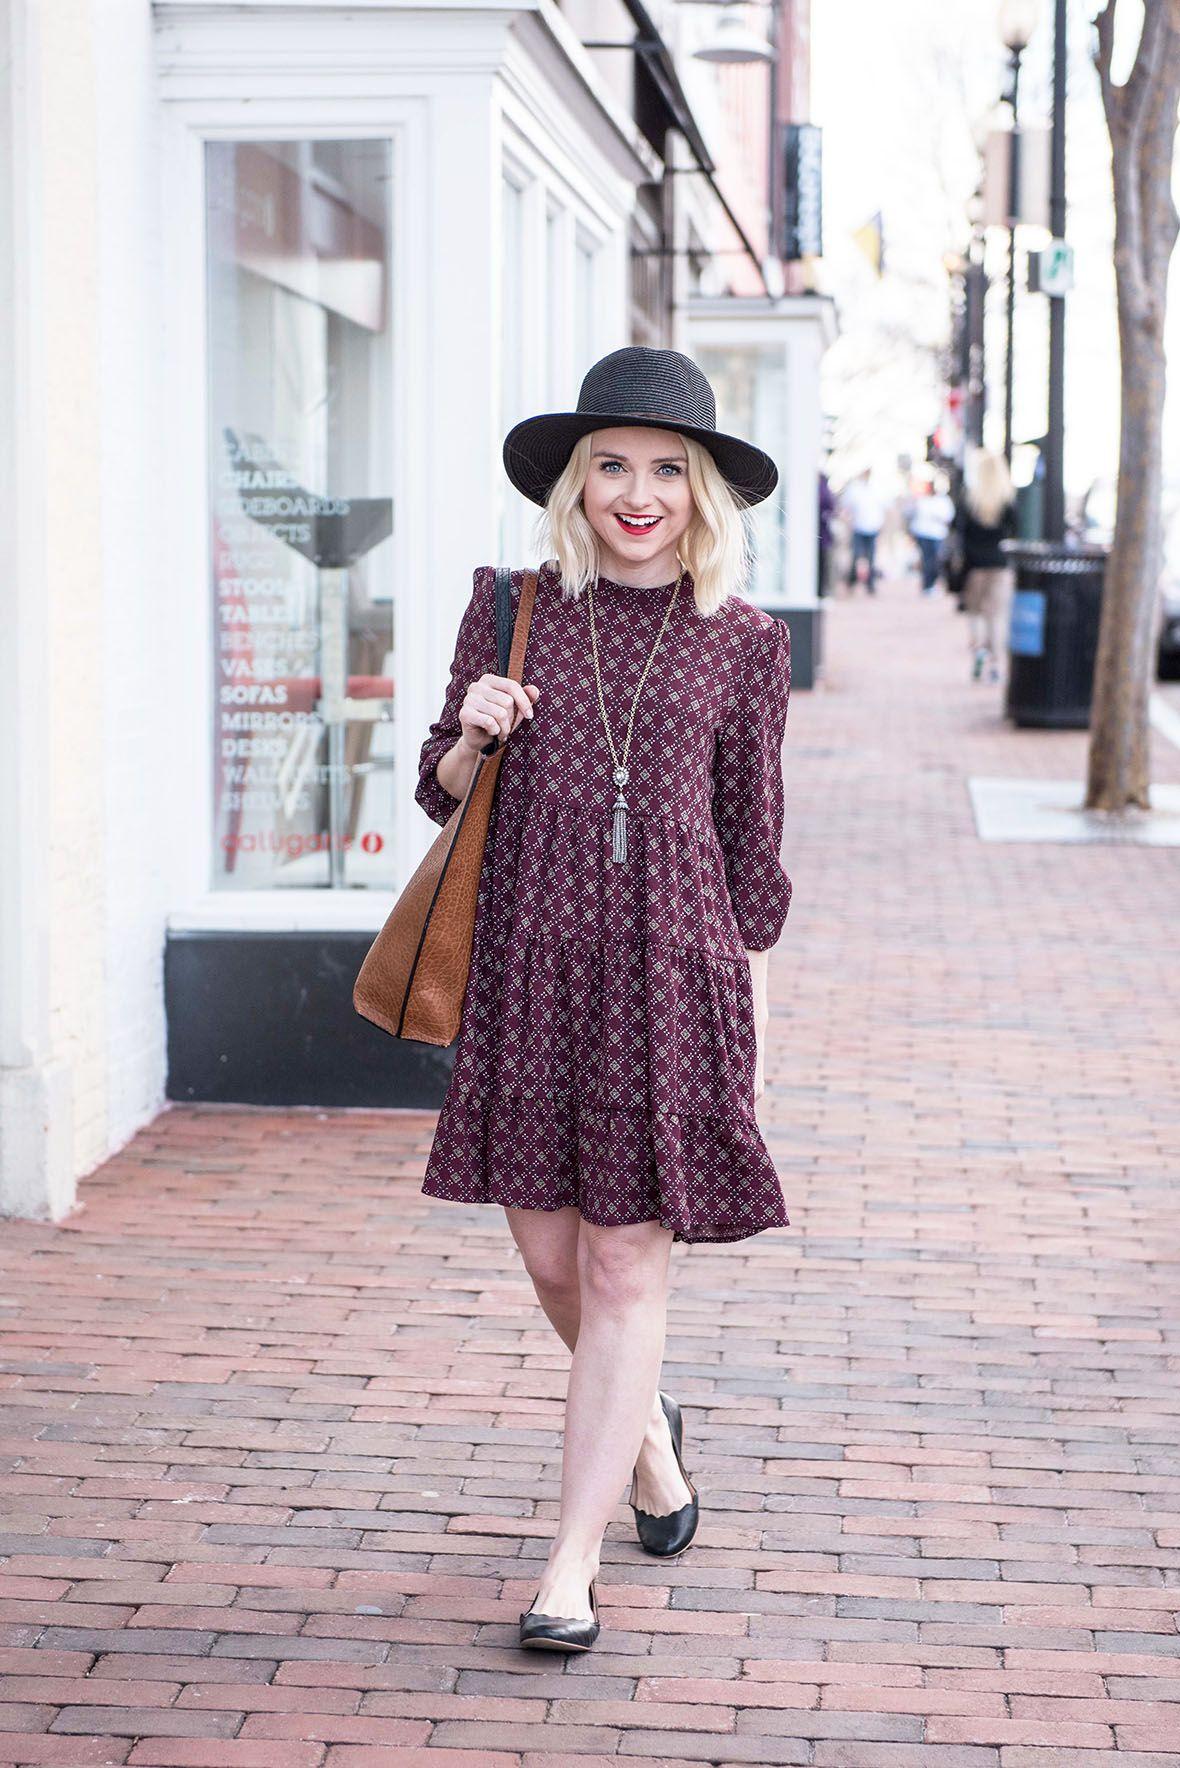 jewel tone floral dress, black hat and flats